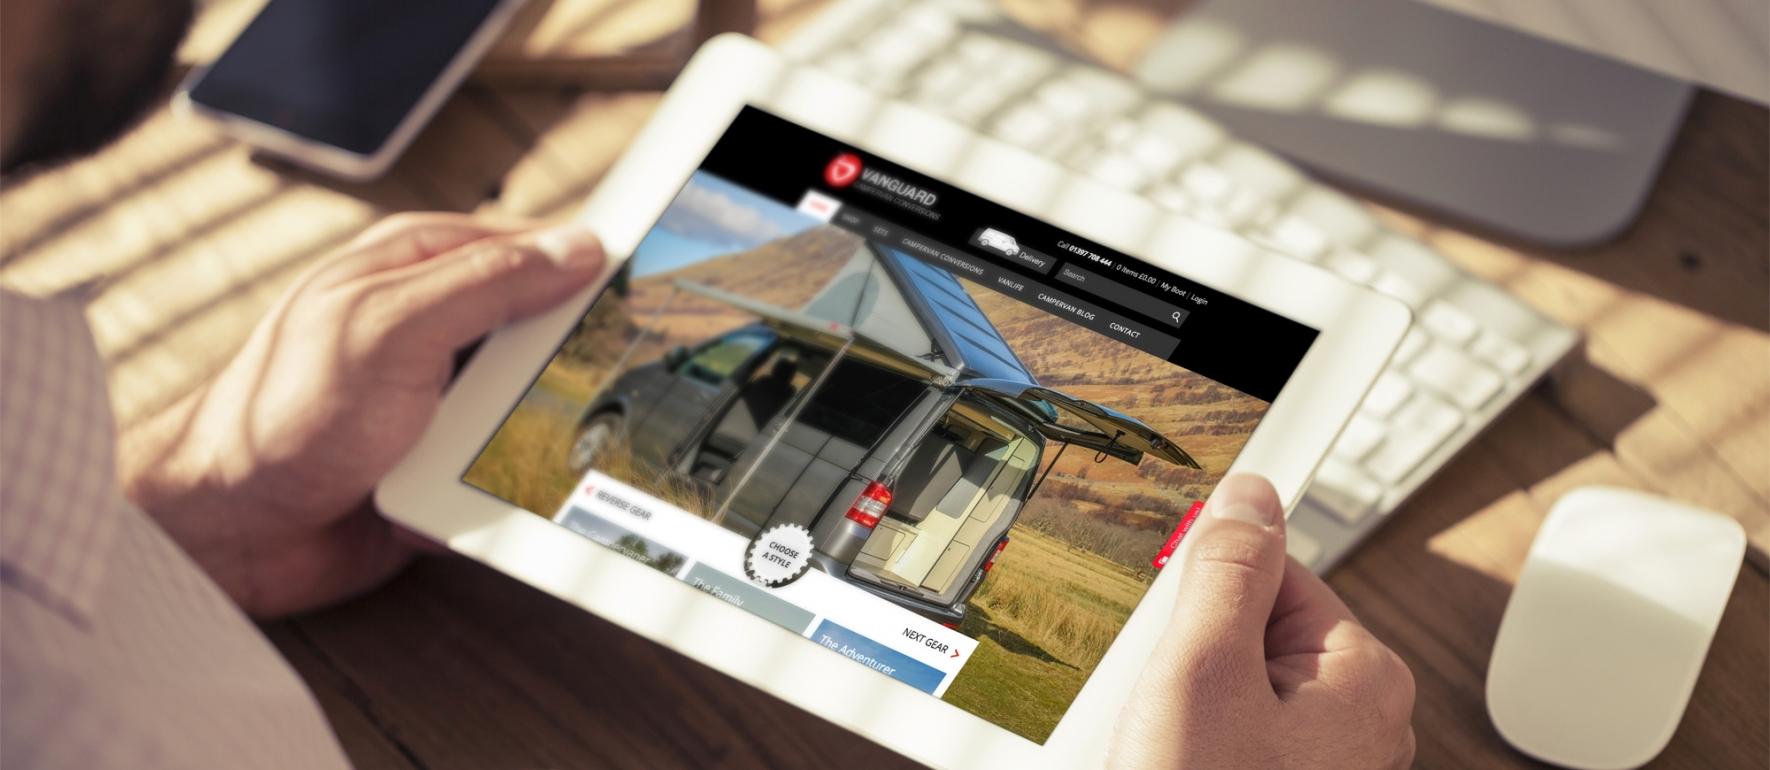 Responsive Website Design Edinburgh